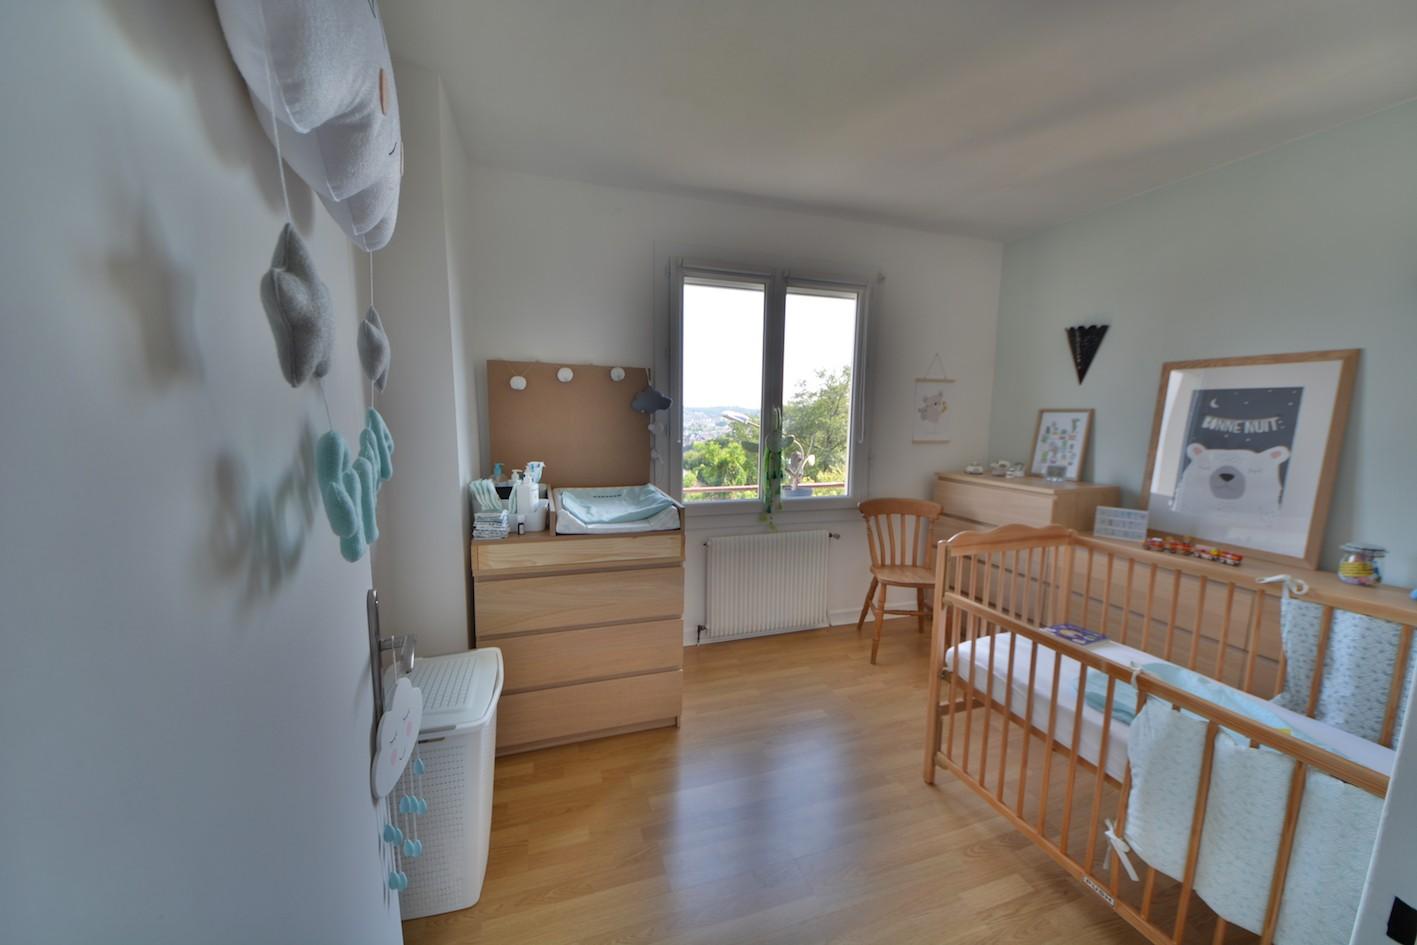 brive la gaillarde hopital vente appartement 4 pi ces 70m2 97 000 r f 5827 lesprit. Black Bedroom Furniture Sets. Home Design Ideas